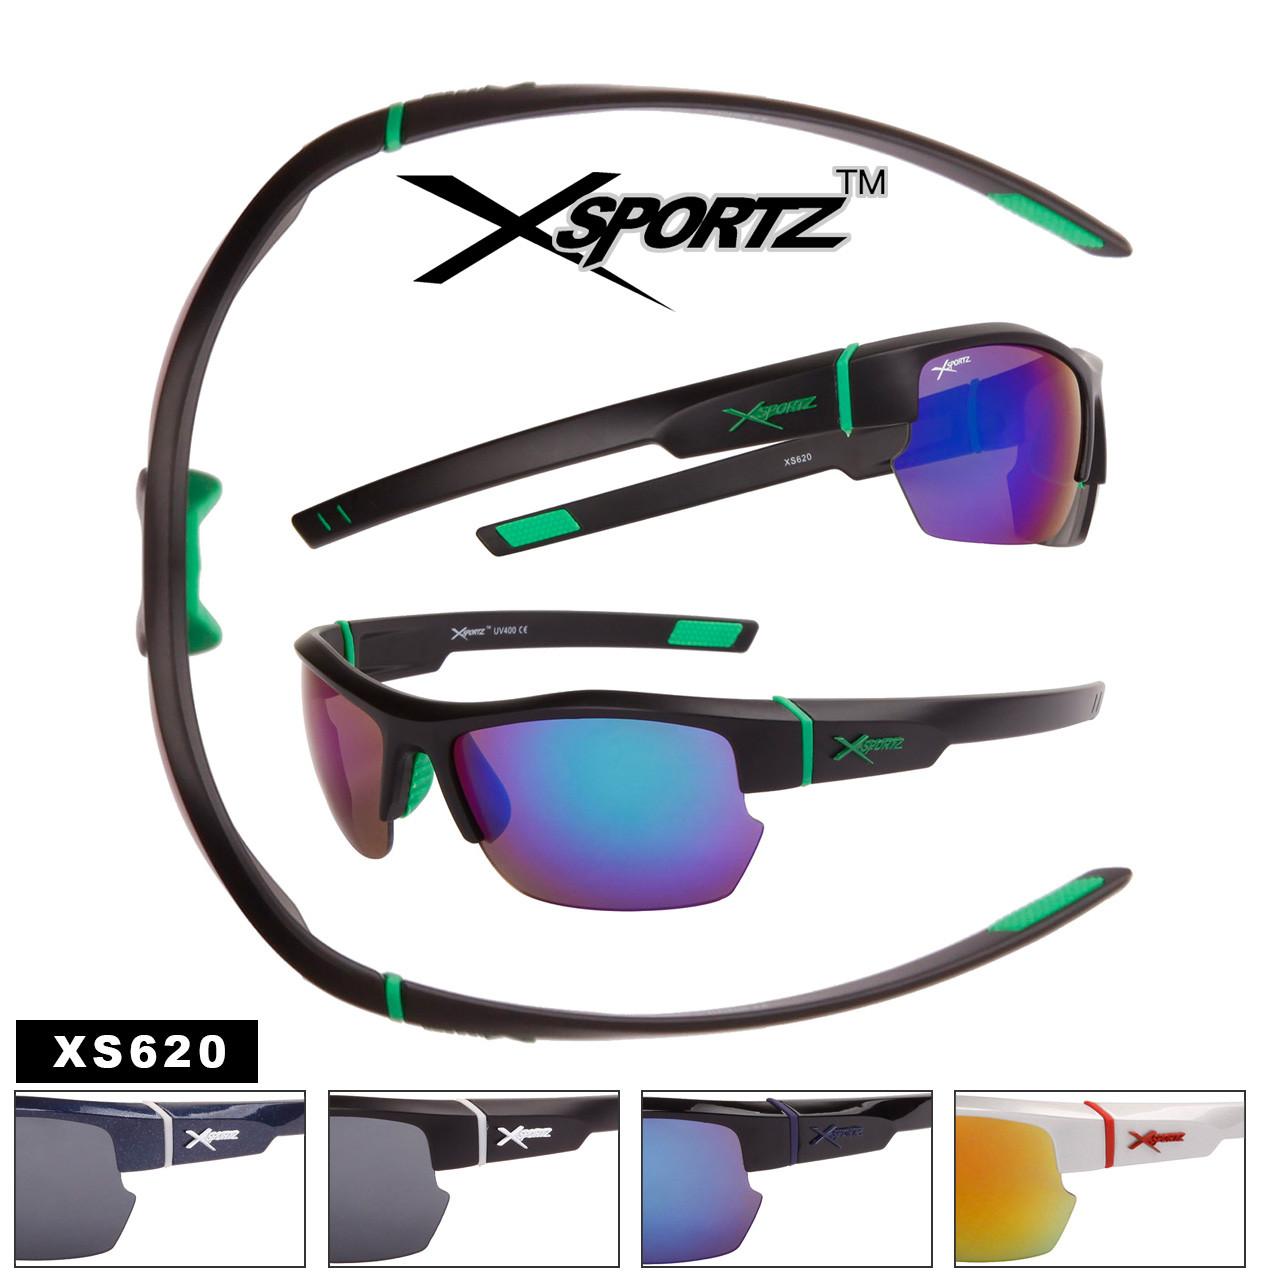 Xsportz™ Semi-Rim Wrap Around Sport Sunglasses - Style #XS620